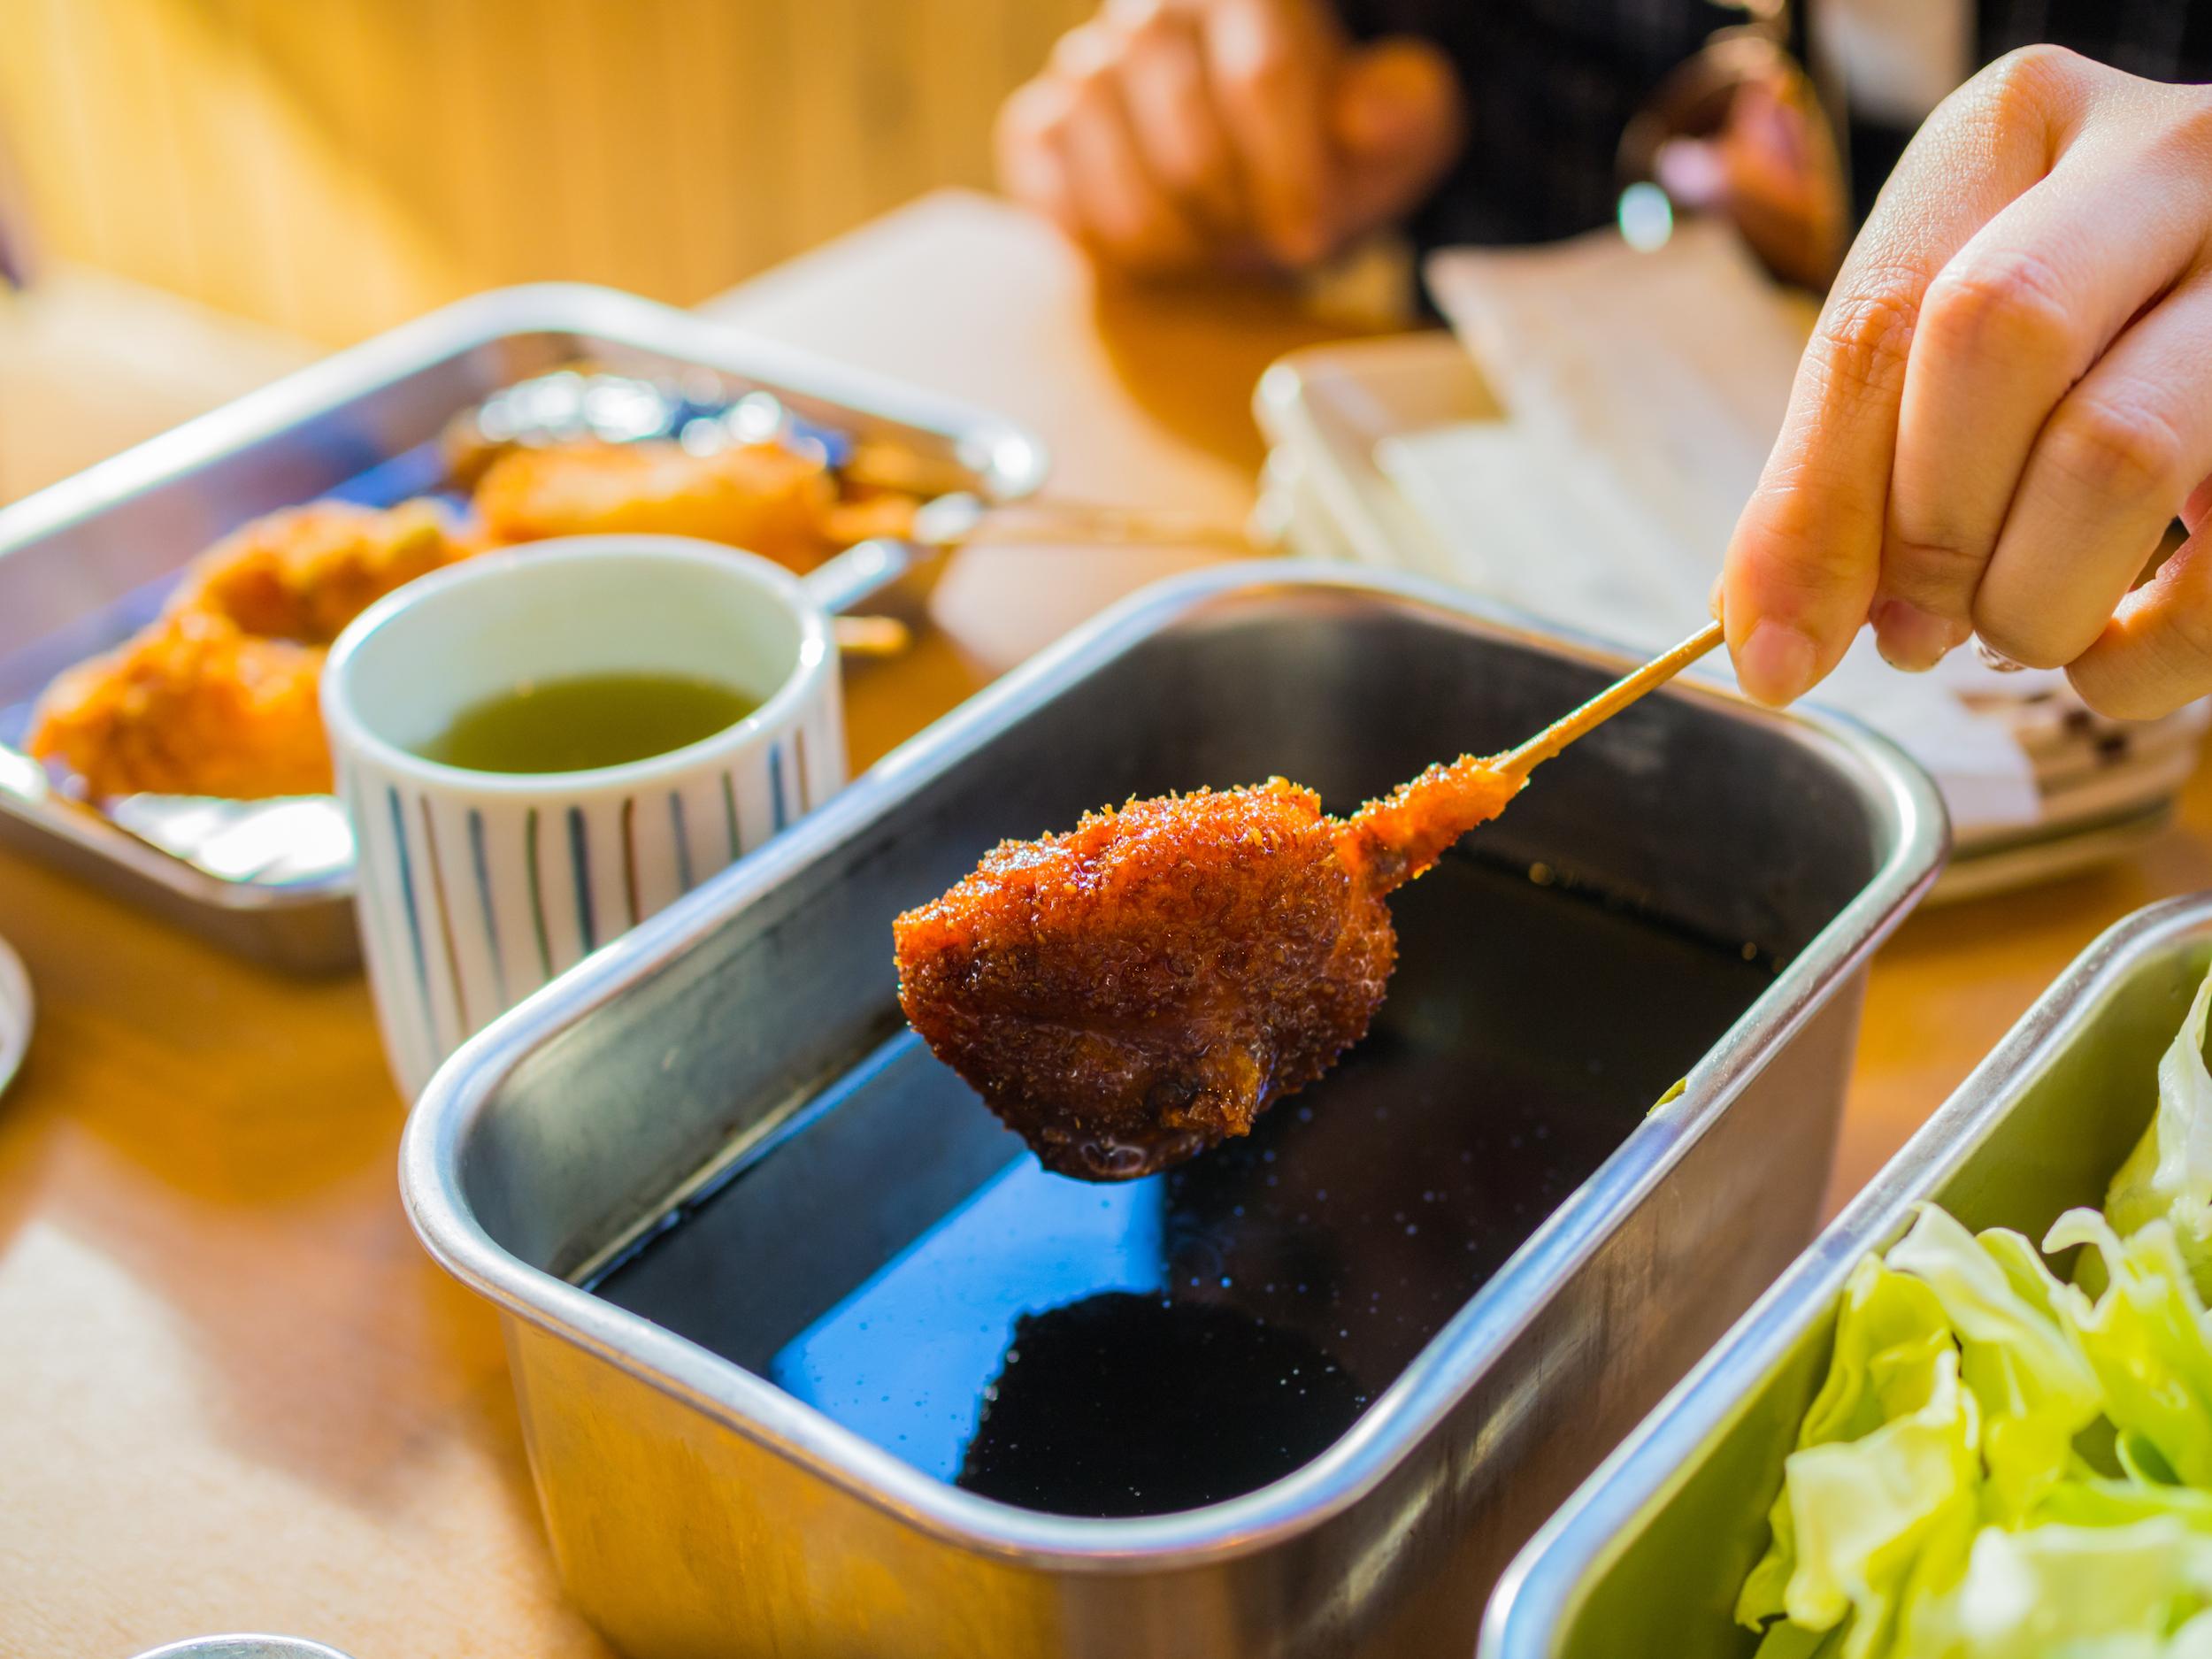 Kushikatsu, a deep-fried Japanese skewer, with sauce